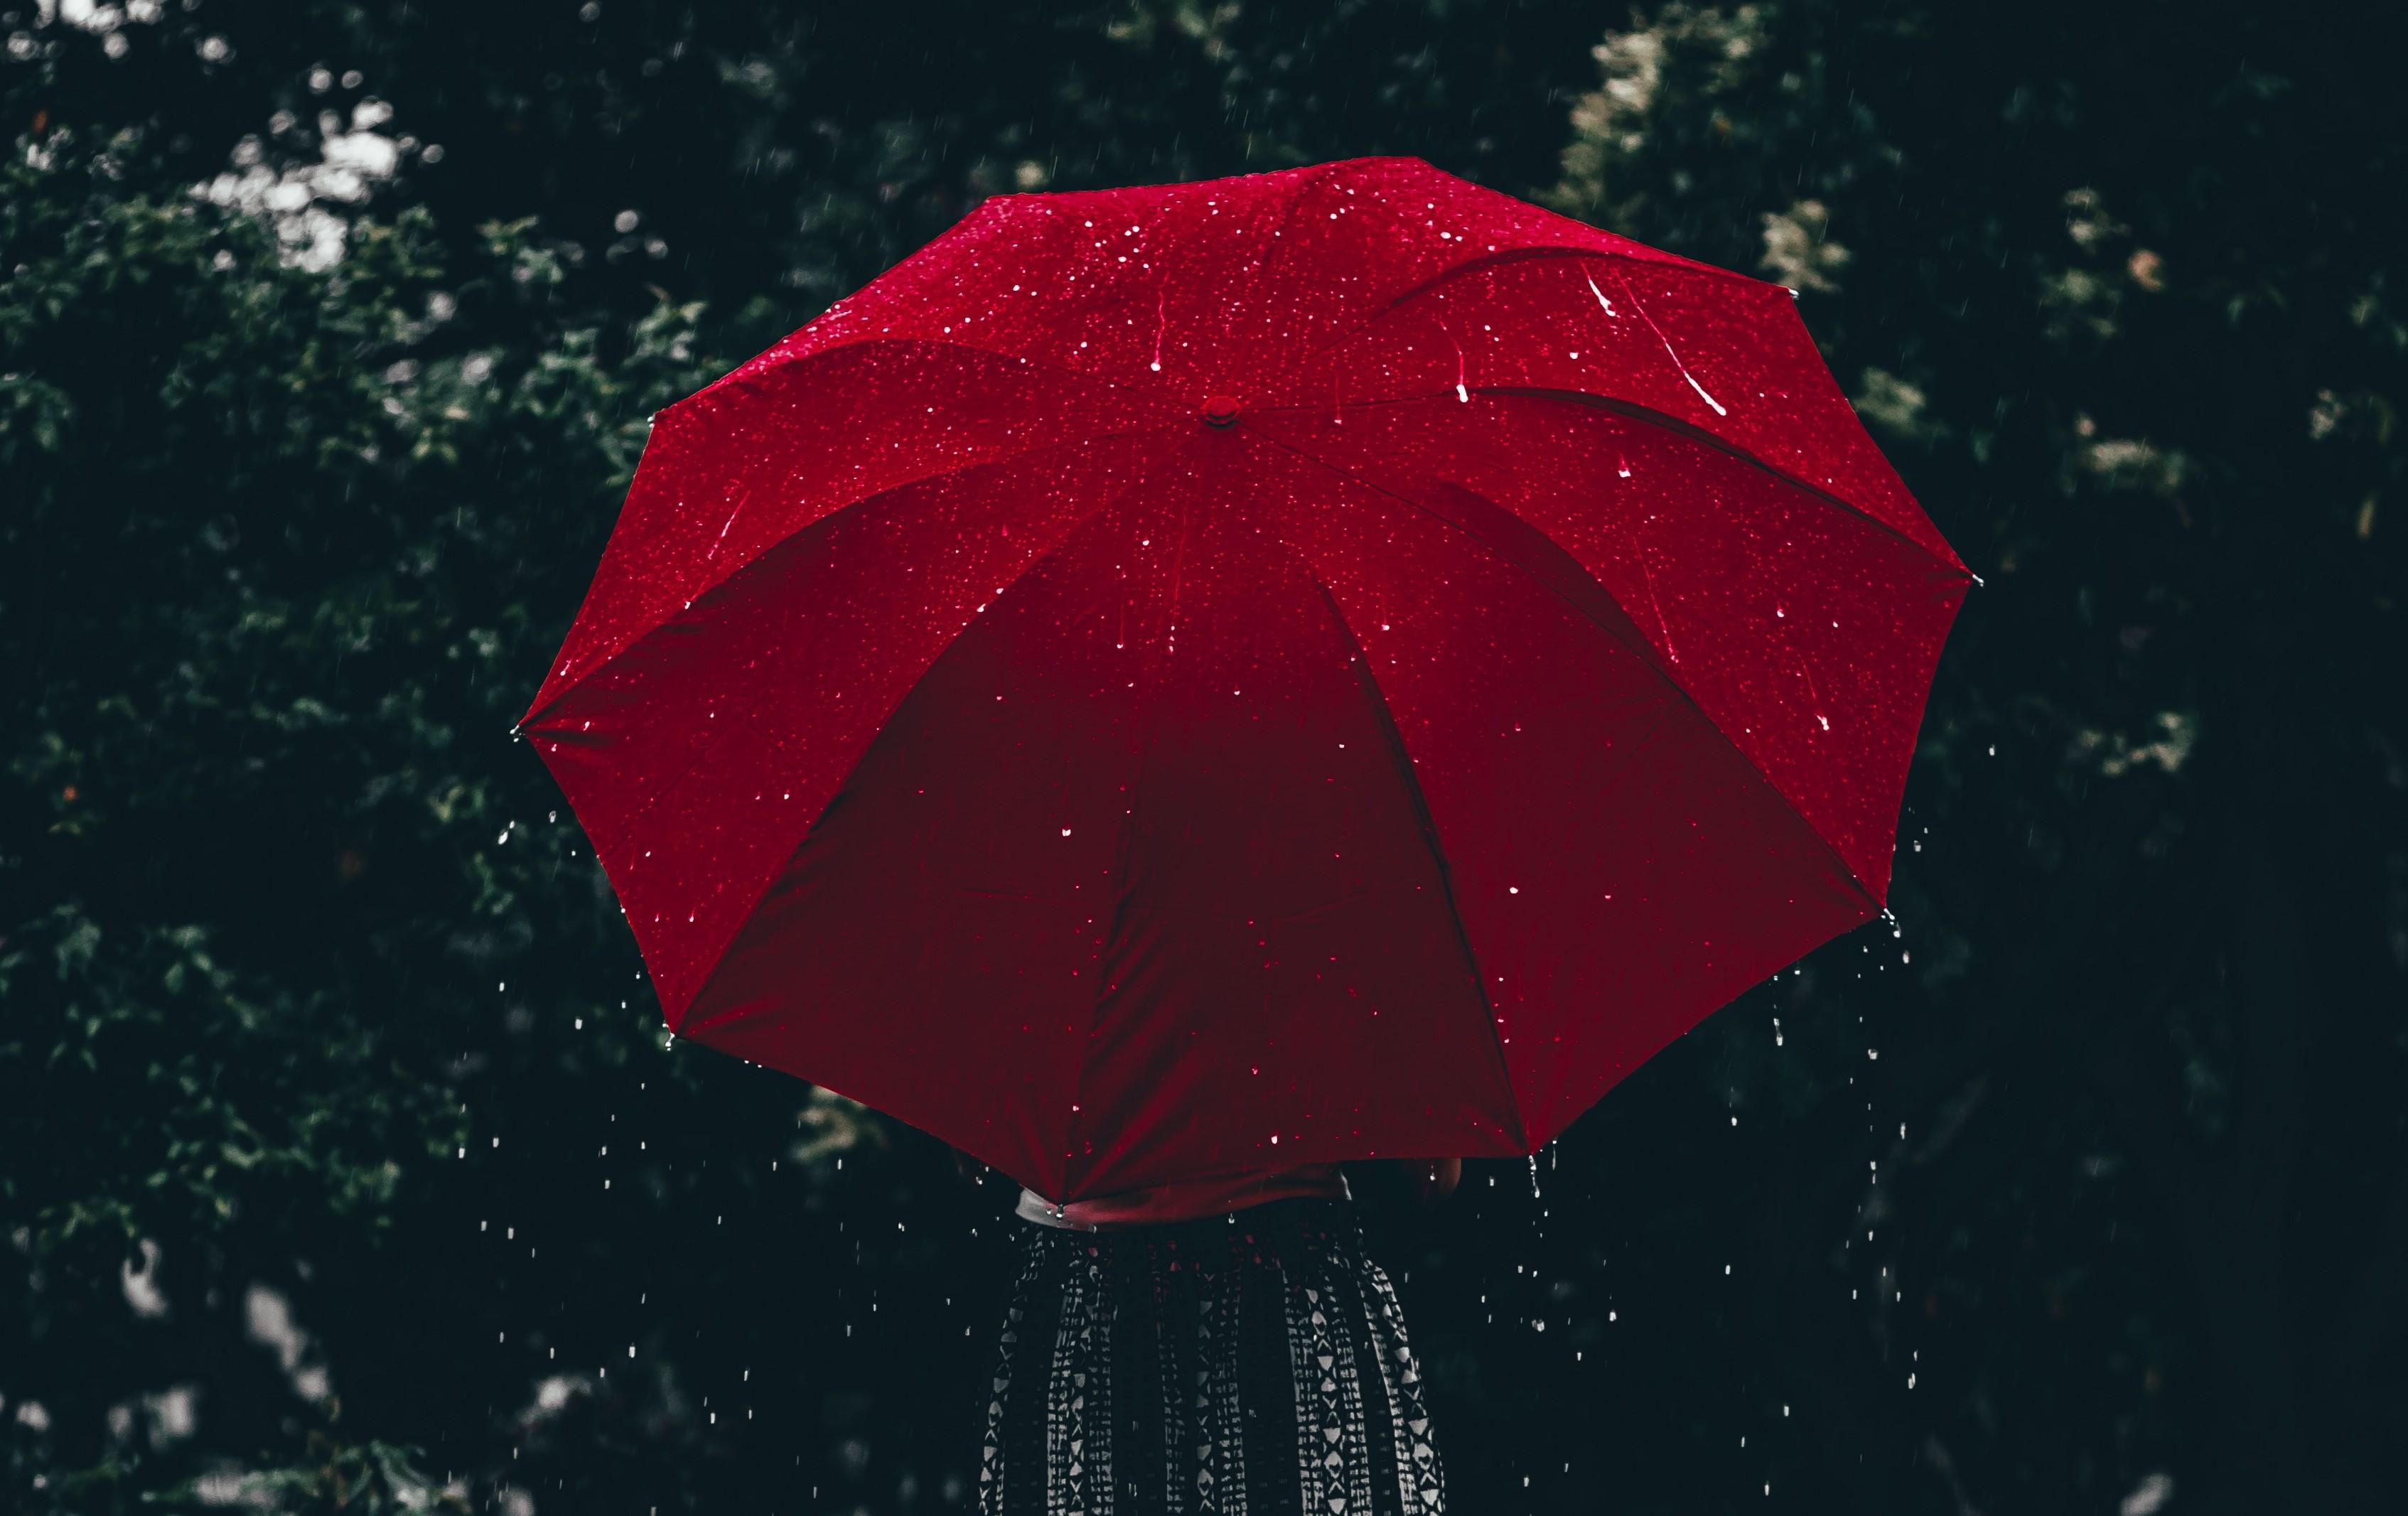 Hungry Ghost Festival Singapore Creepy Umbrella